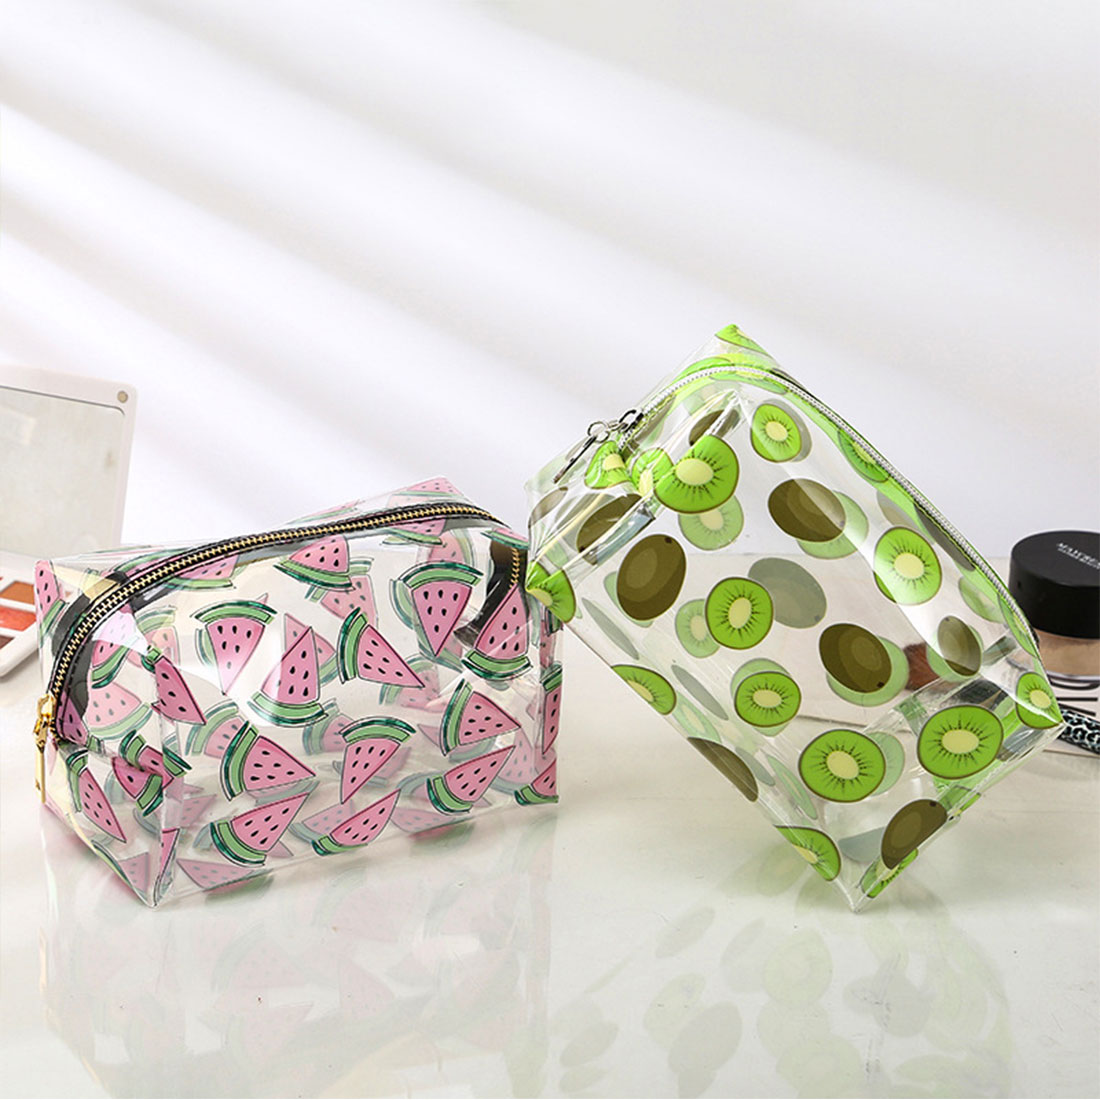 Bolsa Hipster de gelatina, Mini suministro, bolsa de cosméticos fresca, barata, Dropshipping, bolsa de maquillaje de fruta, nueva bolsa de almacenamiento transparente creativa para lavado